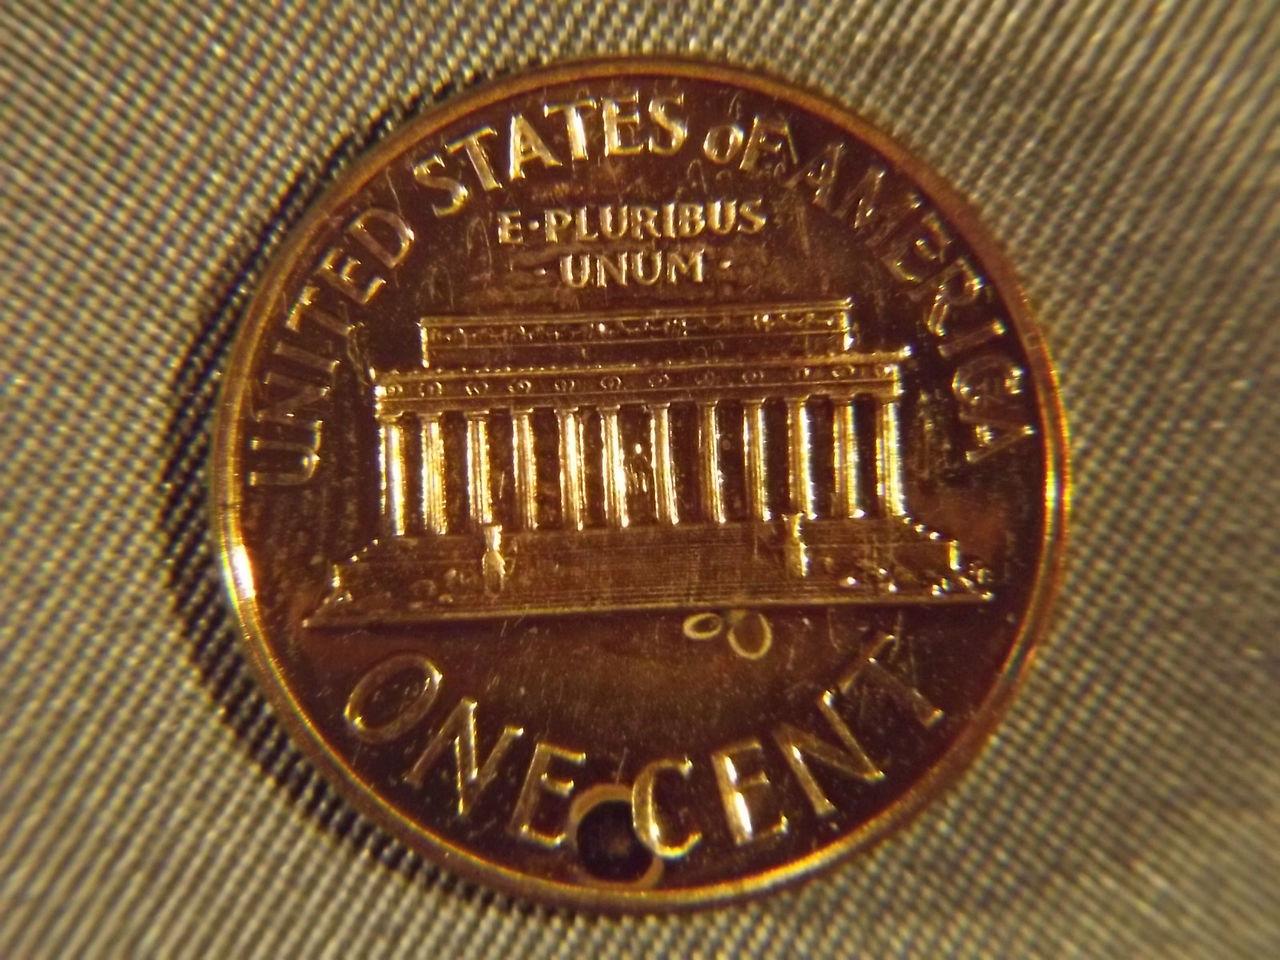 Coleccion Centavos Lincoln 1909-2016 T2e_C16_VHJGQE9no_M_Kn_KBRSS9i_K0_Rw_60_57